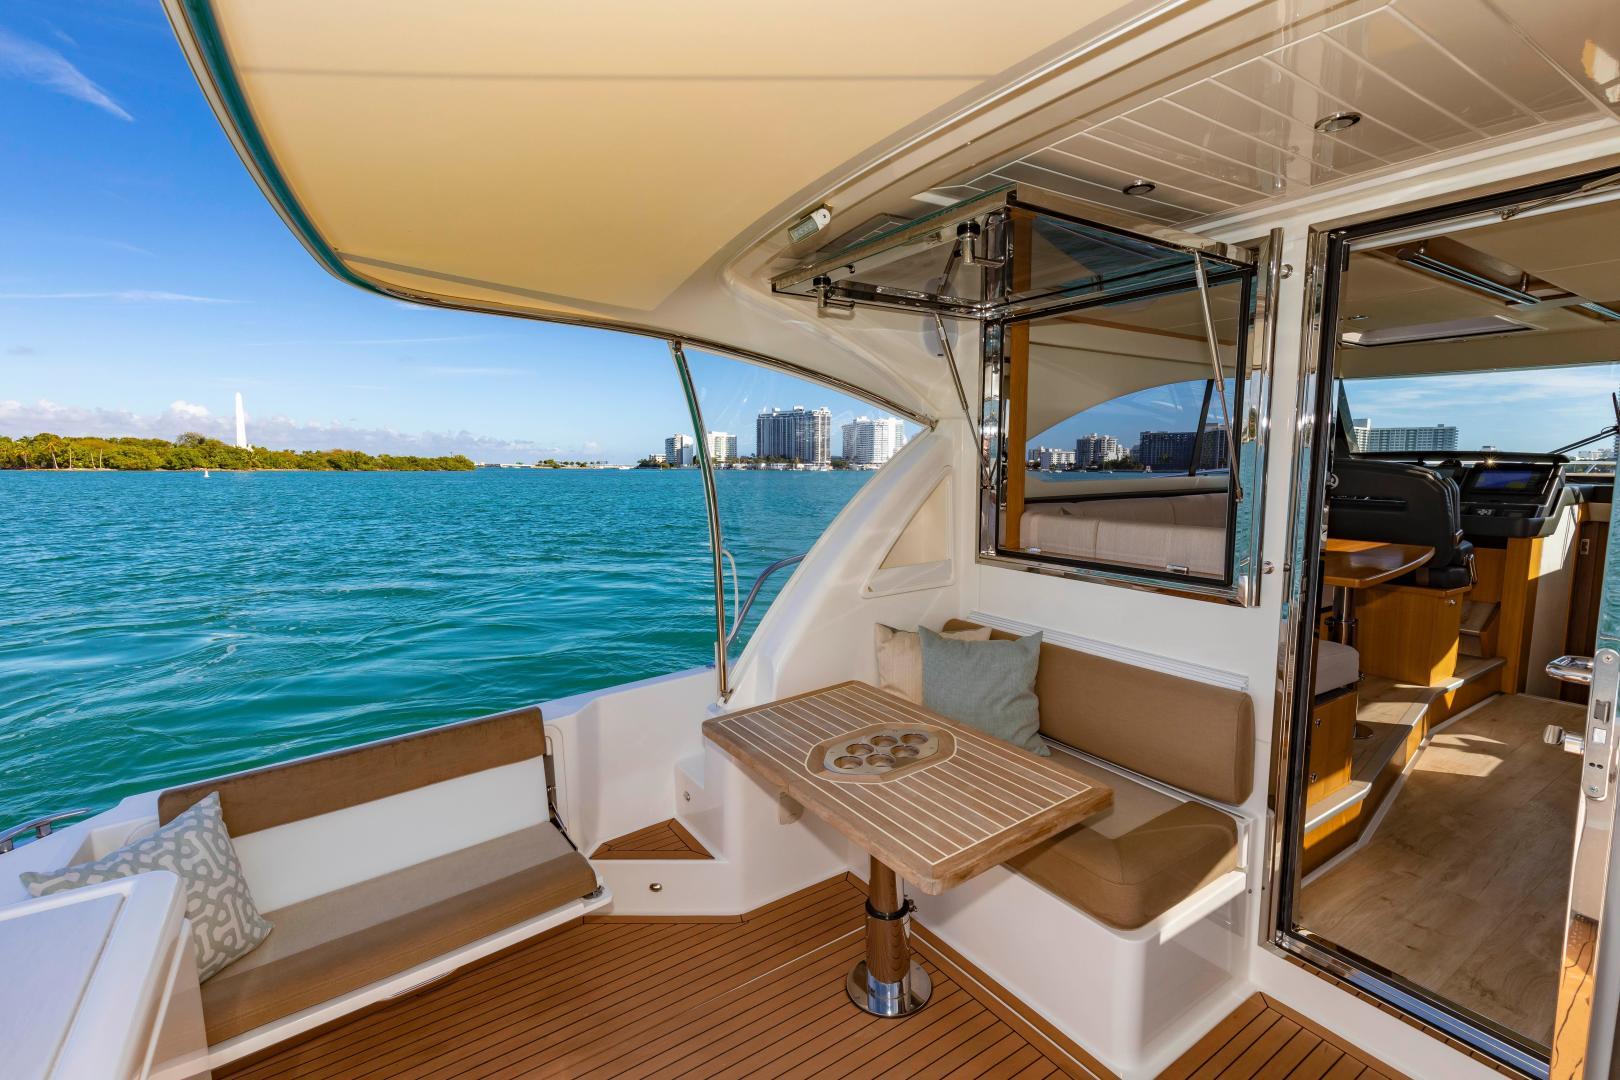 Riviera-395 SUV 2019-Ipanema Miami Beach-Florida-United States-1614886   Thumbnail